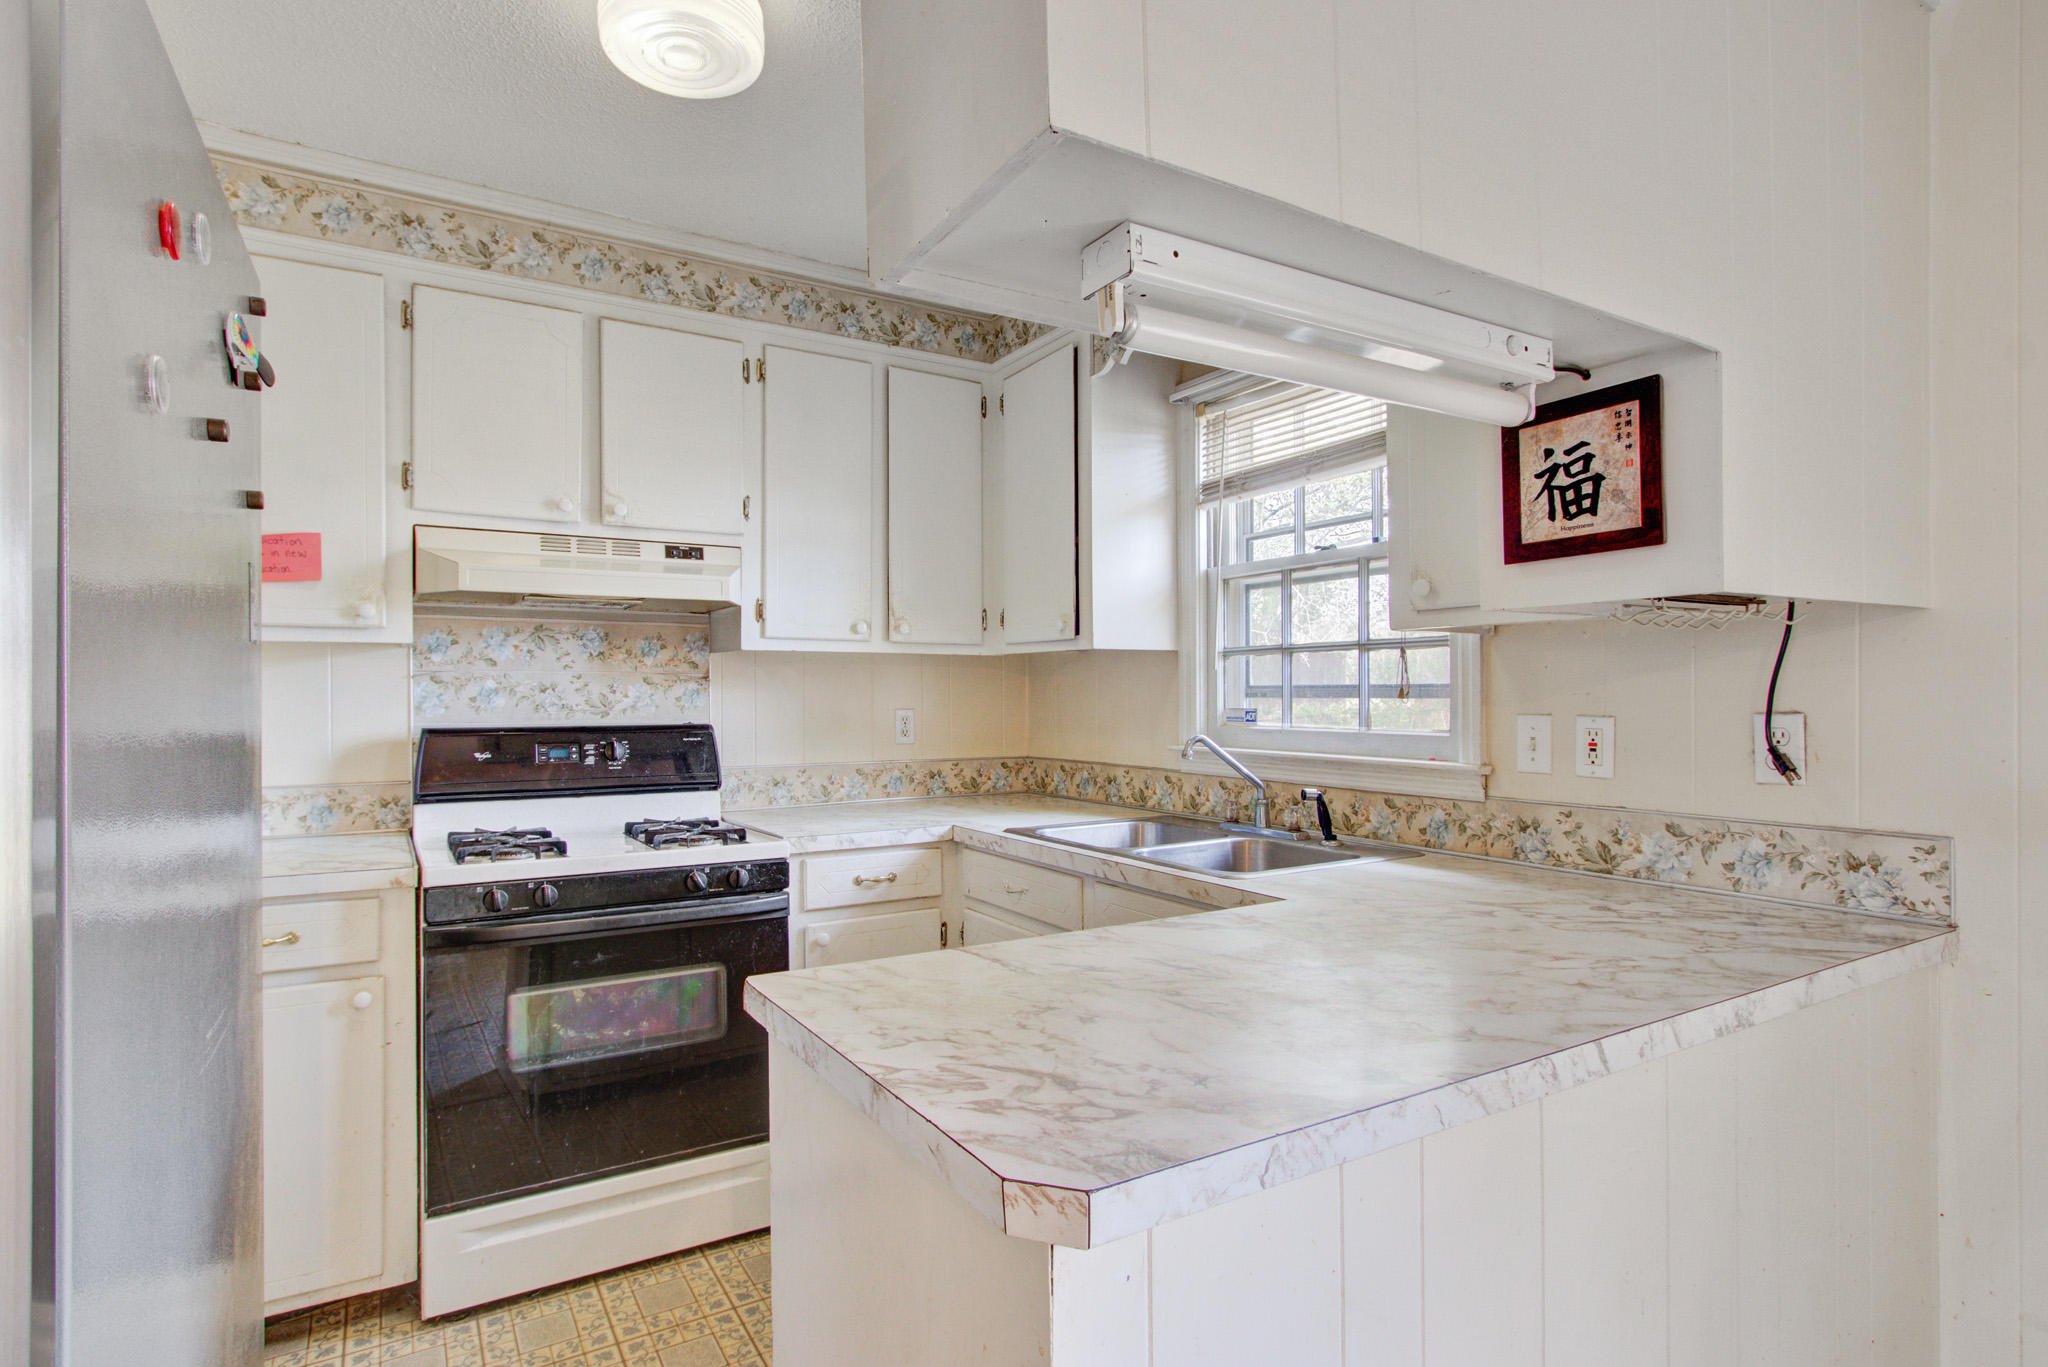 Bushy Park Terrace Homes For Sale - 125 Azalea, Goose Creek, SC - 15